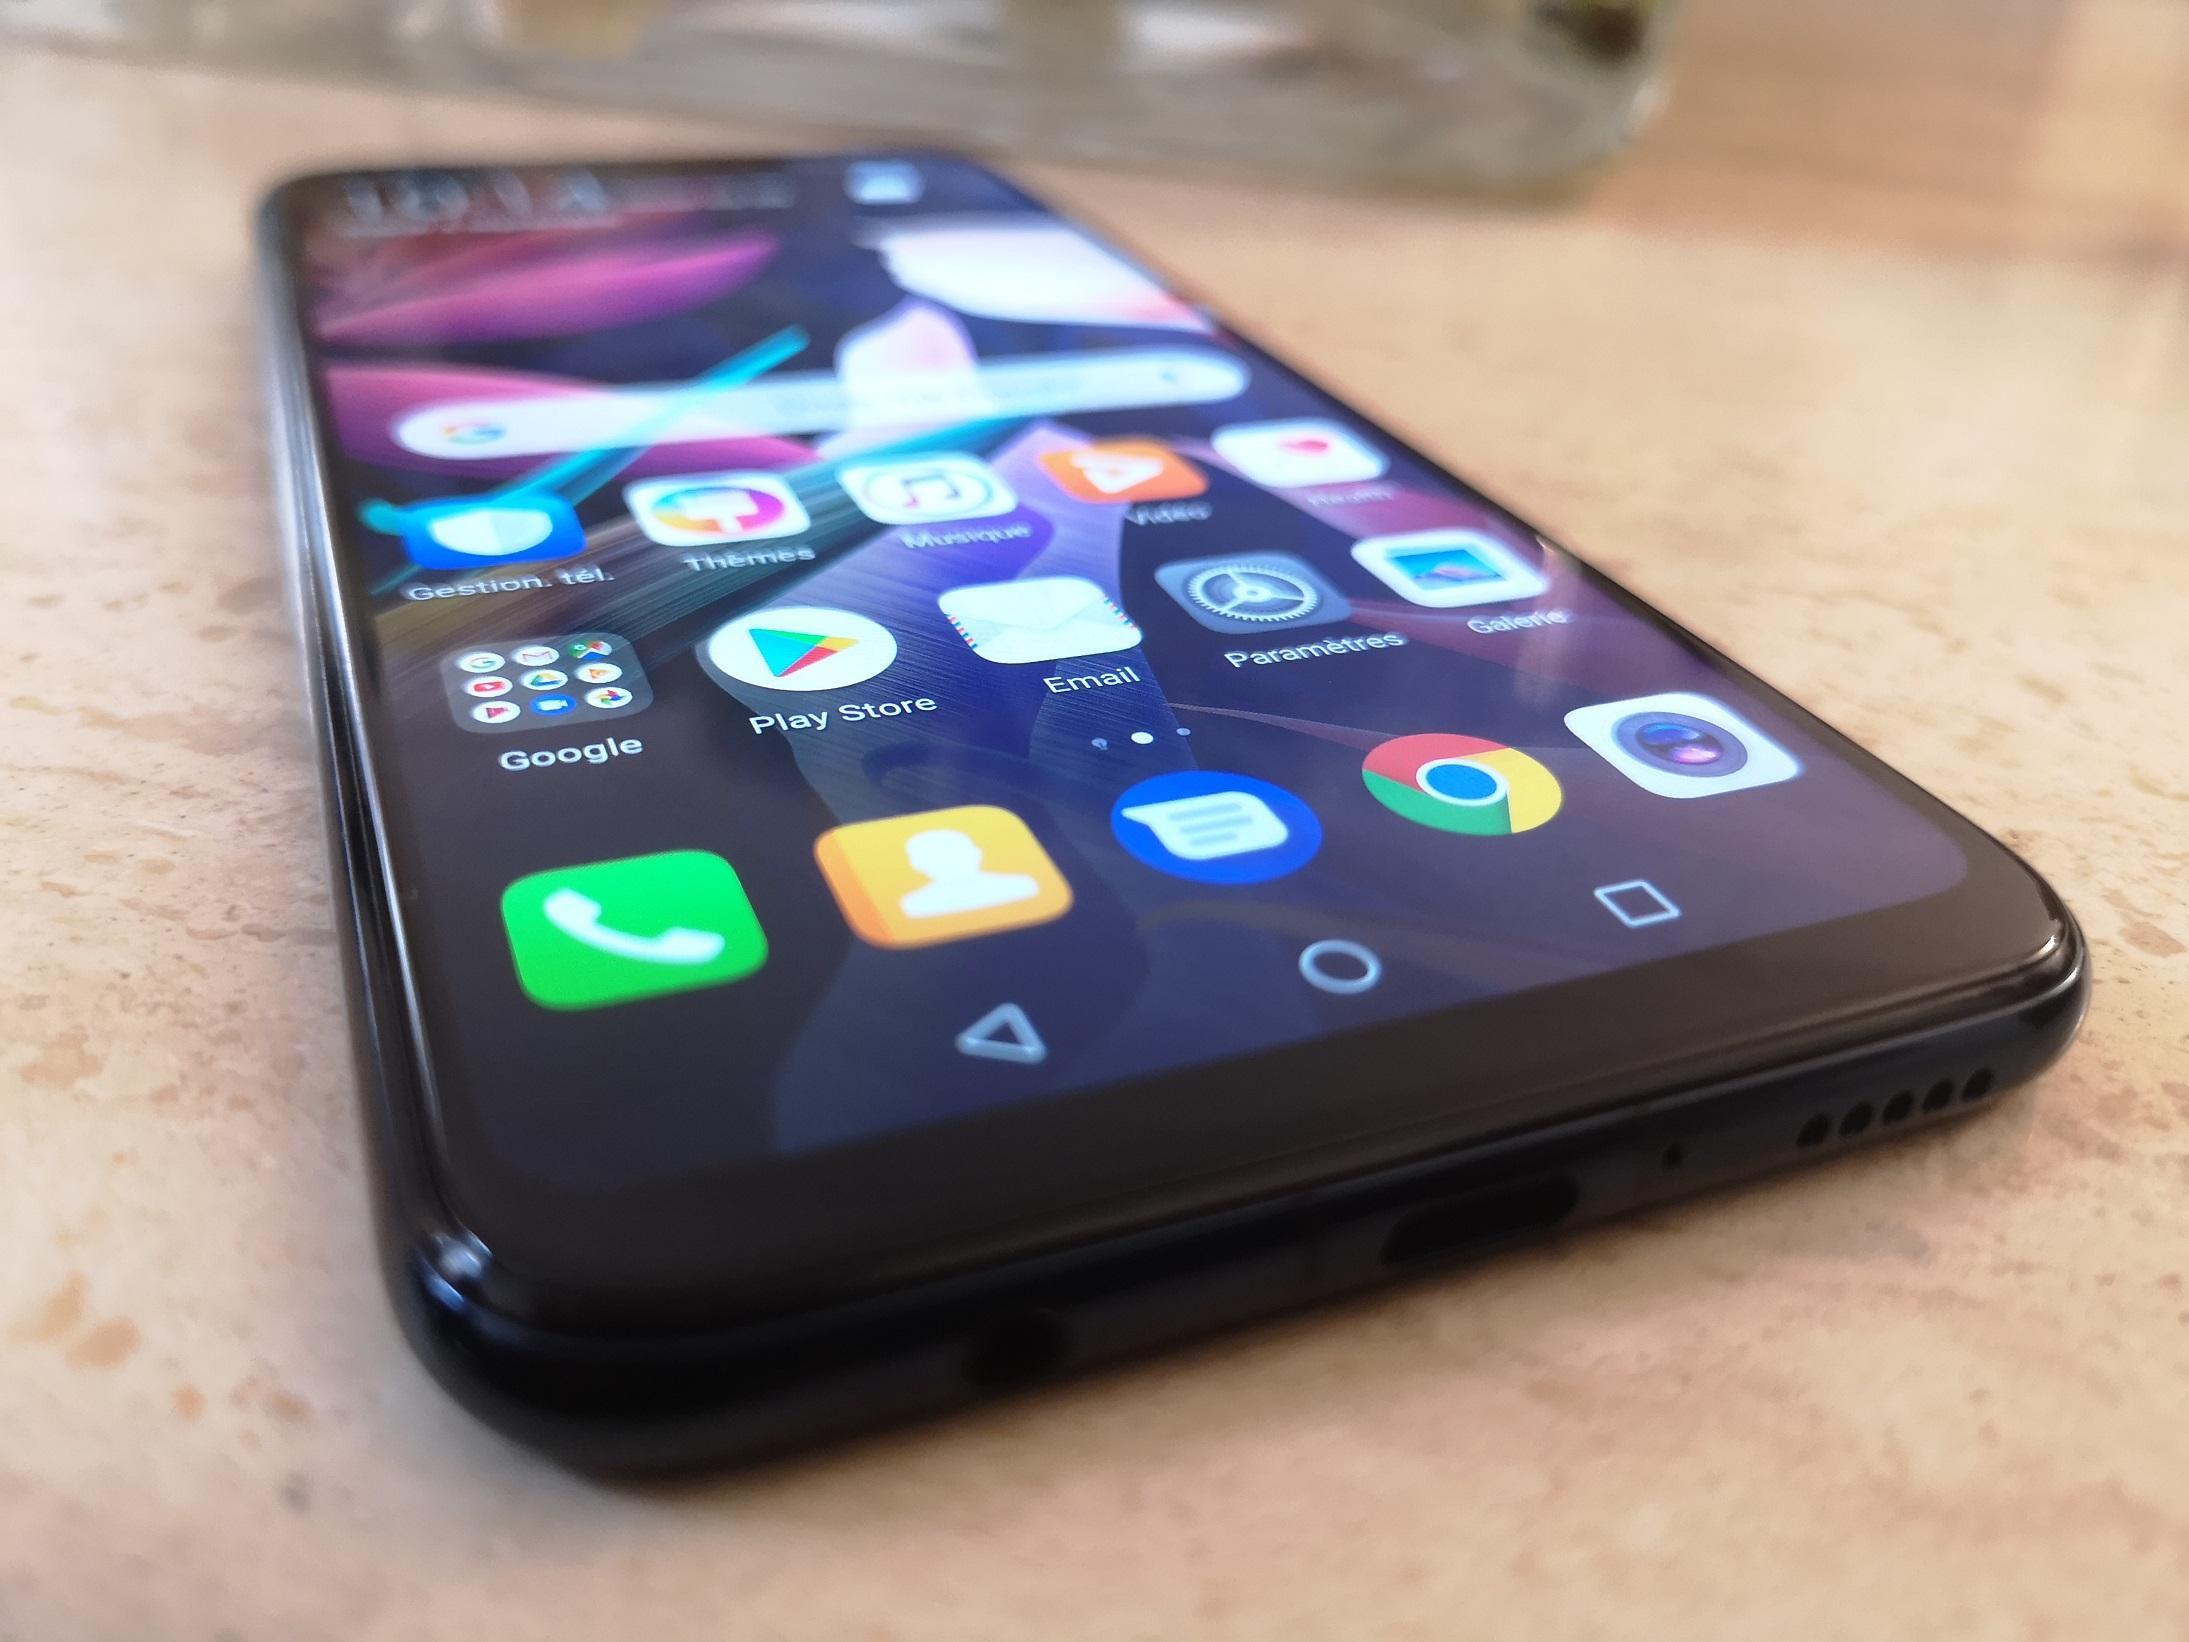 Huawei Mate 20 Lite test - [ Prise en main IFA 2018 ] Huawei Mate 20 Lite : déjà une référence ?